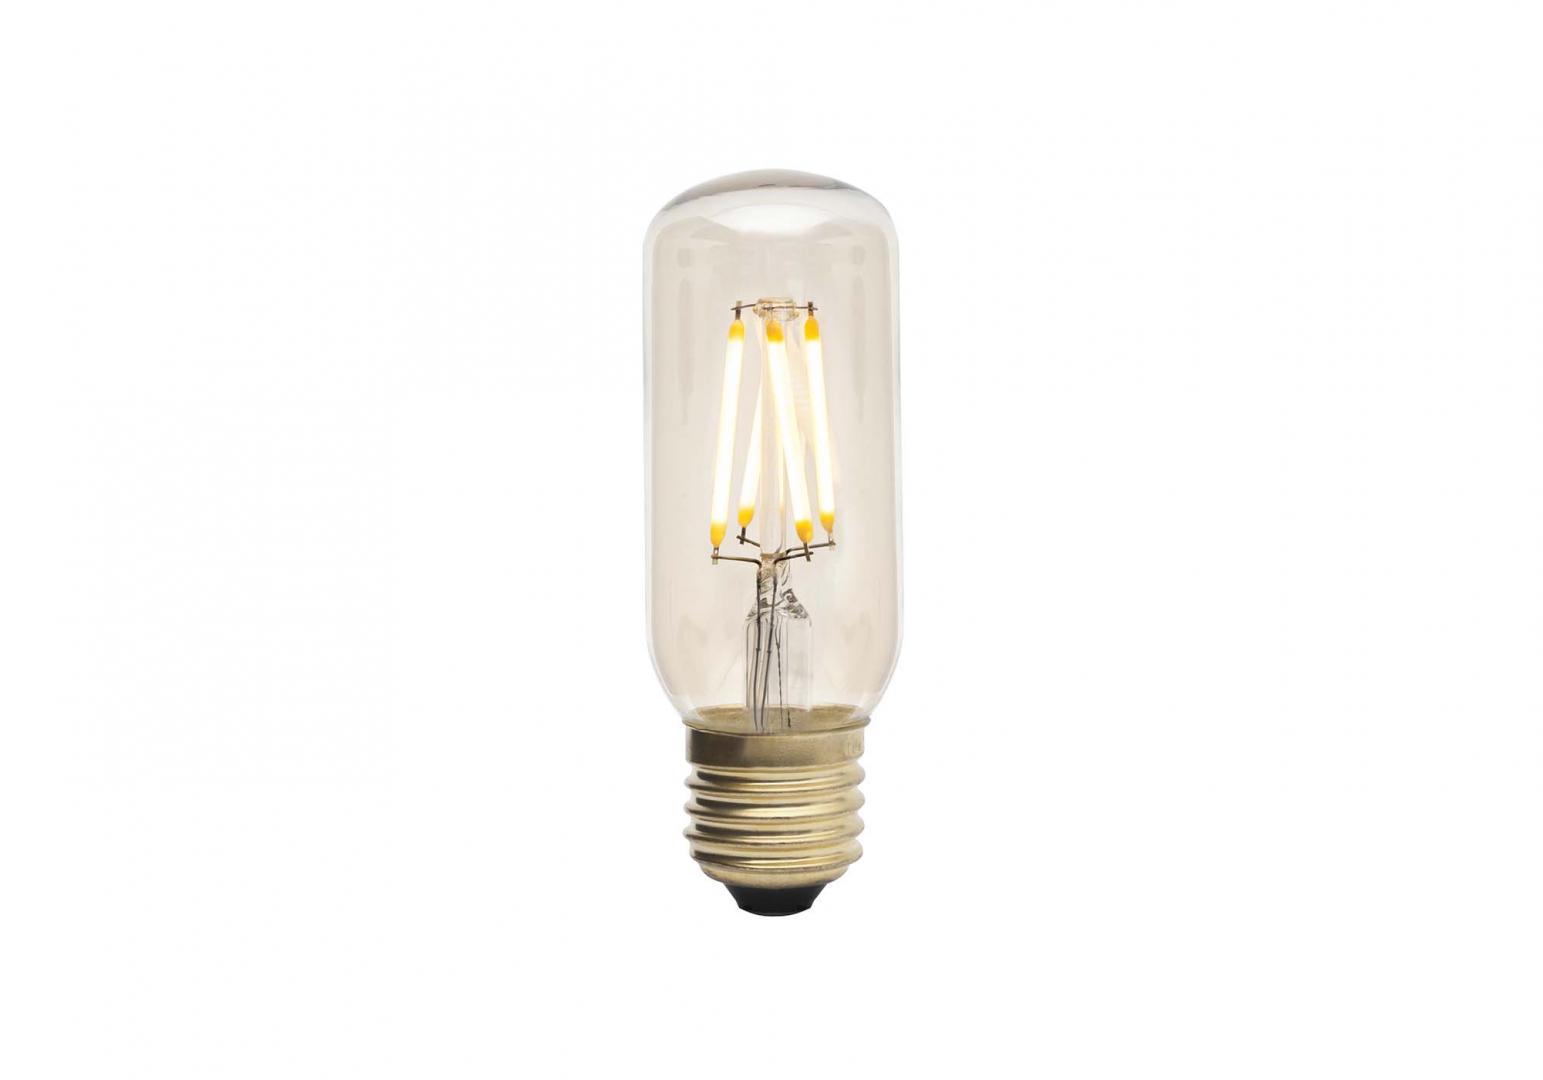 Ampoule Lurra 3 watt - TALALED